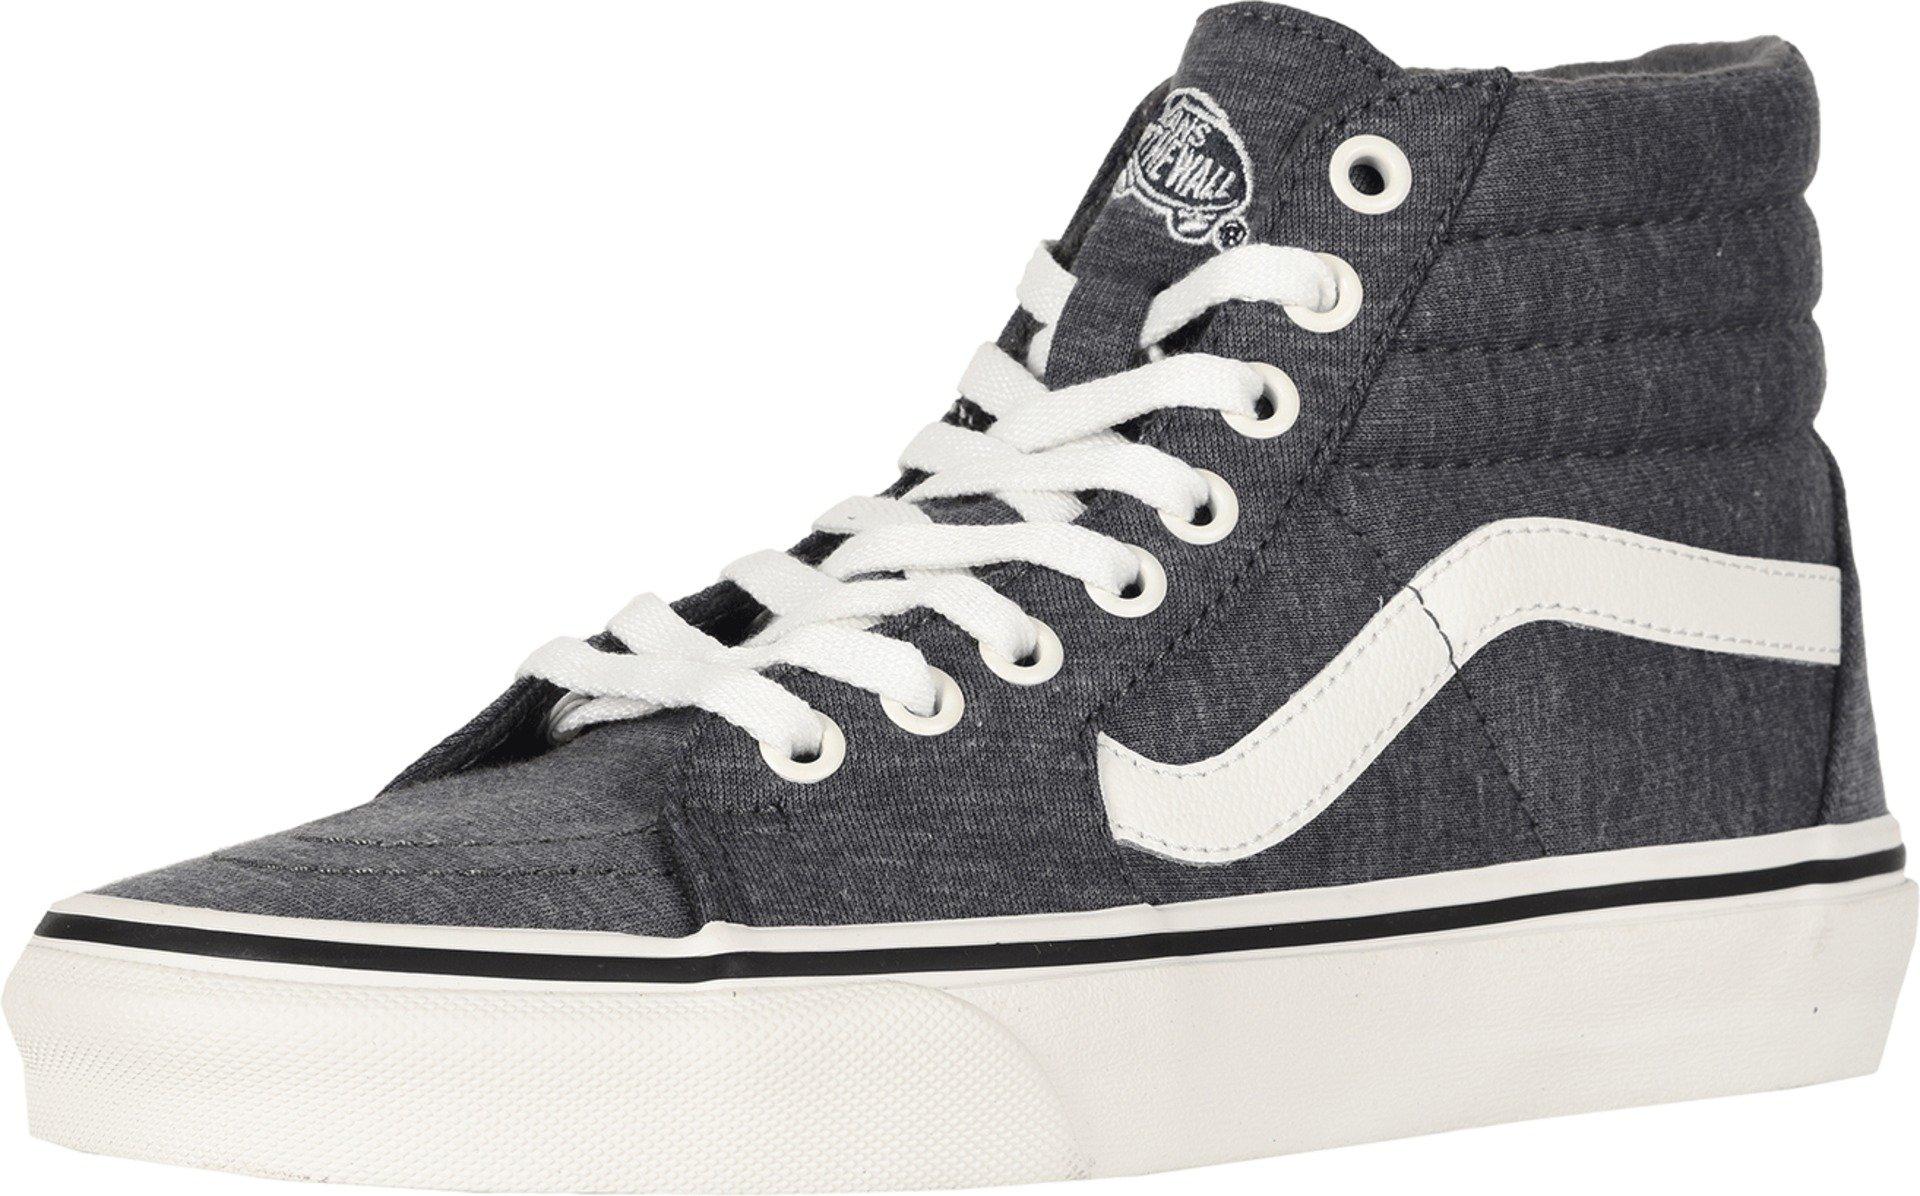 Vans Womens Jersey SK8-Hi Gray/Snow White Sneaker - 6